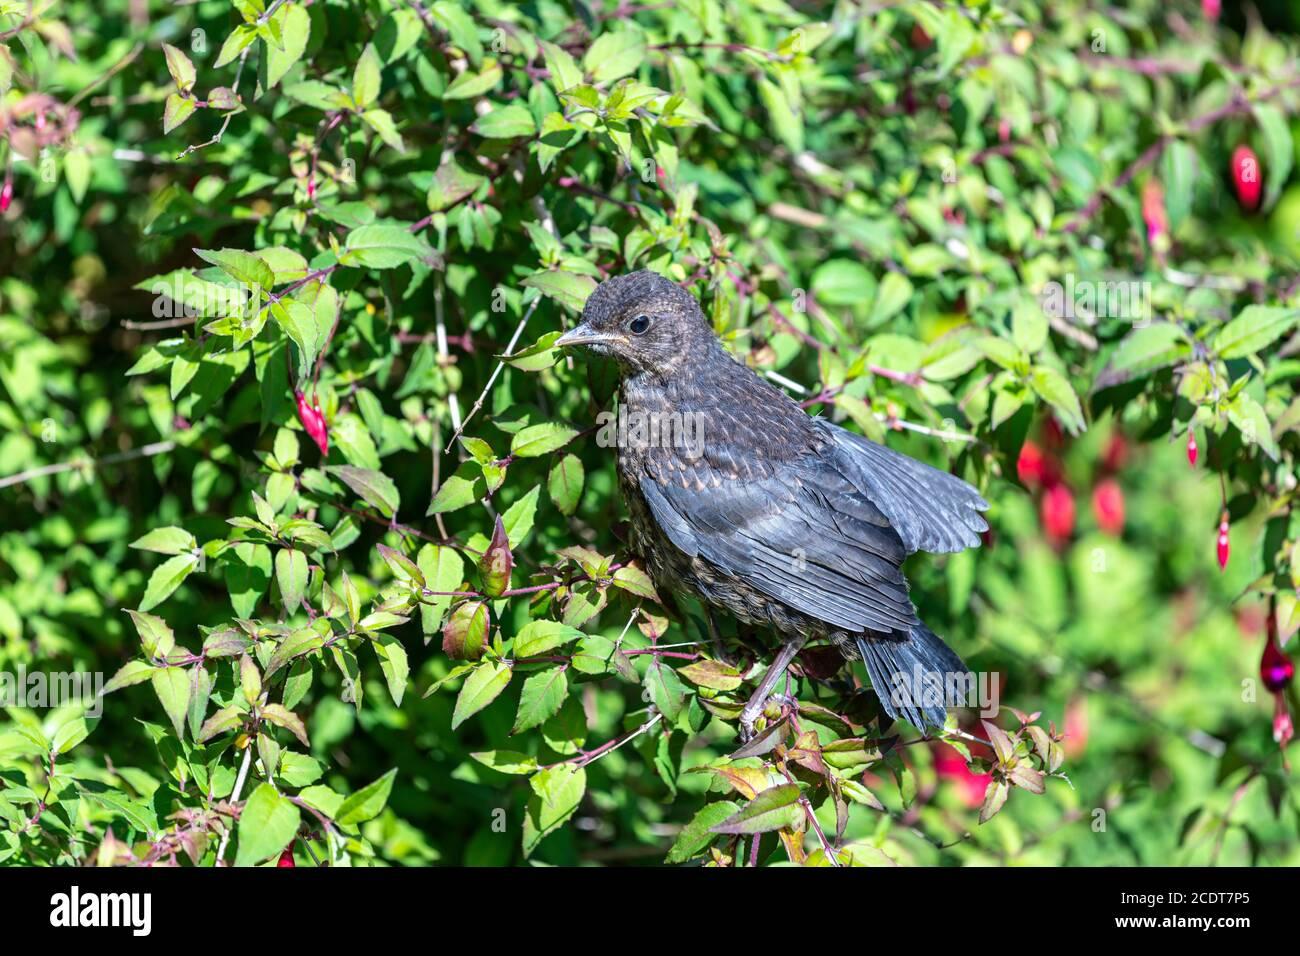 Juvenile European Starling, Sturnus vulgaris, Lancashire, England, Great Britain Stock Photo